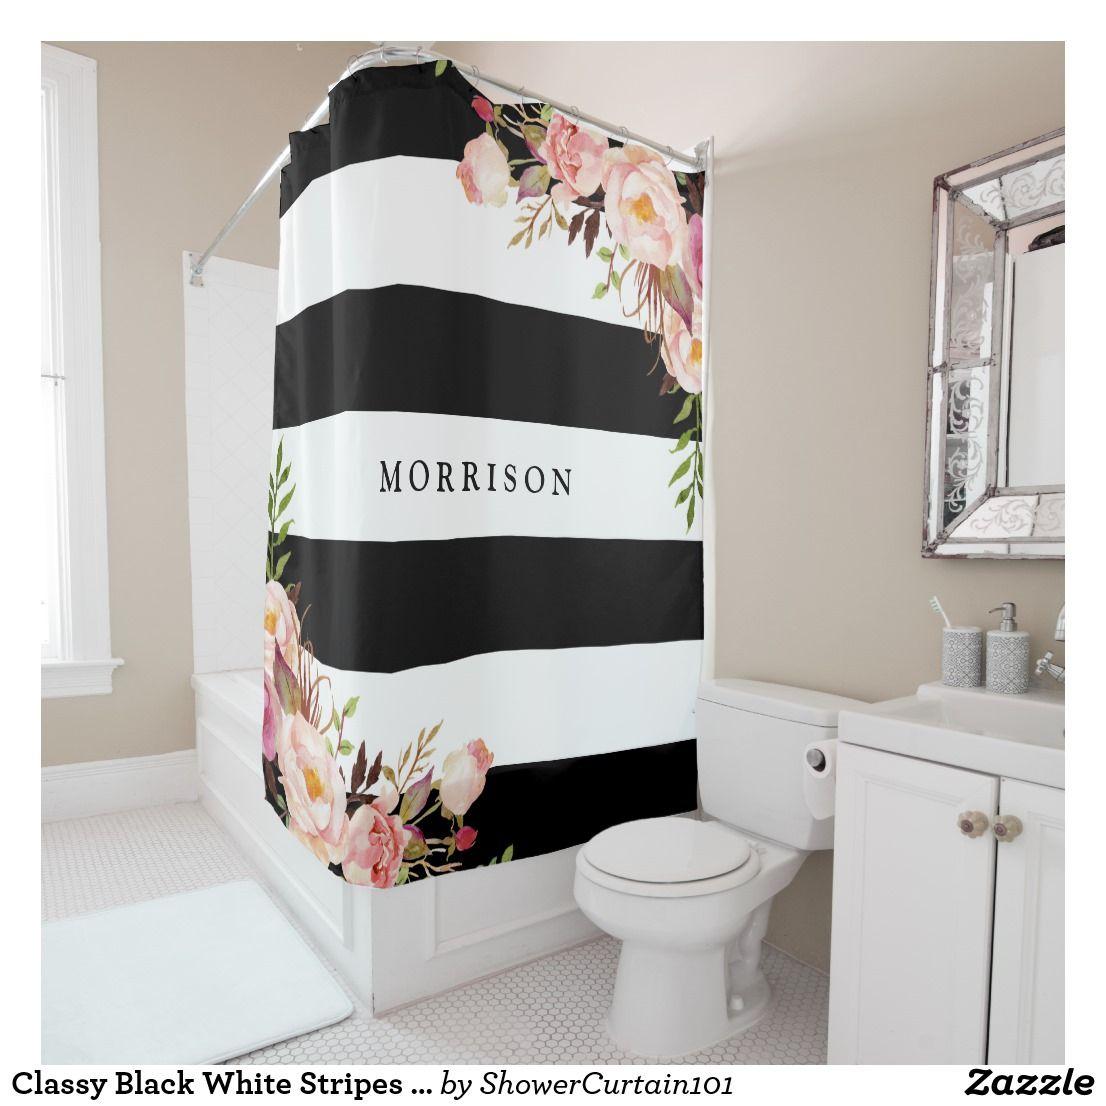 Classy Black White Stripes Vintage Floral Monogram Shower Curtain